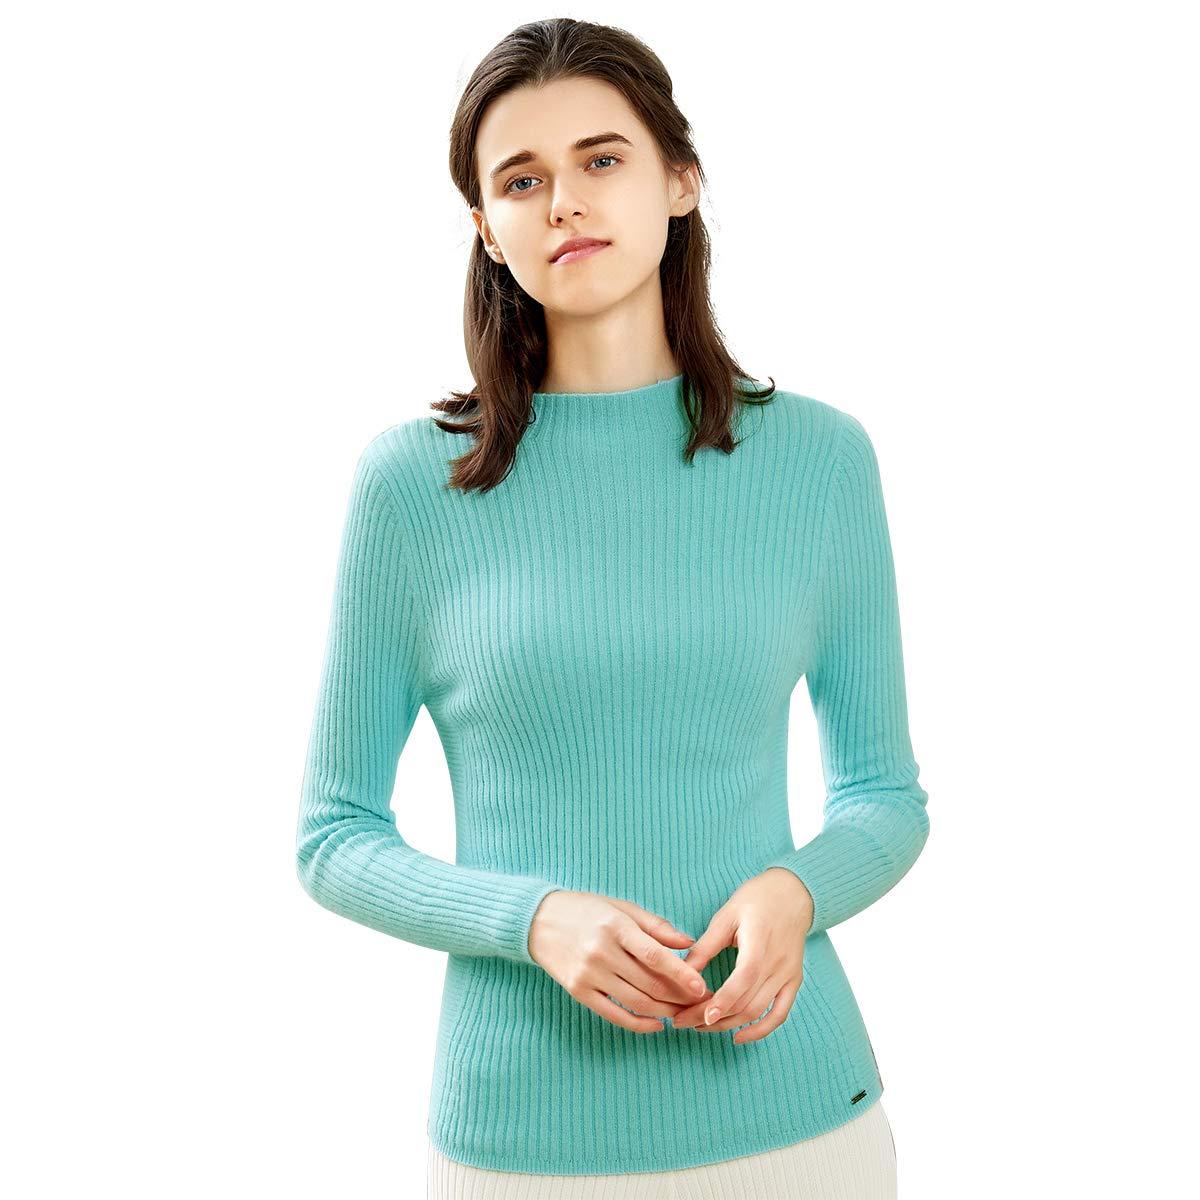 Zhili 2018 Winter Half A Turtleneck Pure color Cashmere Sweater